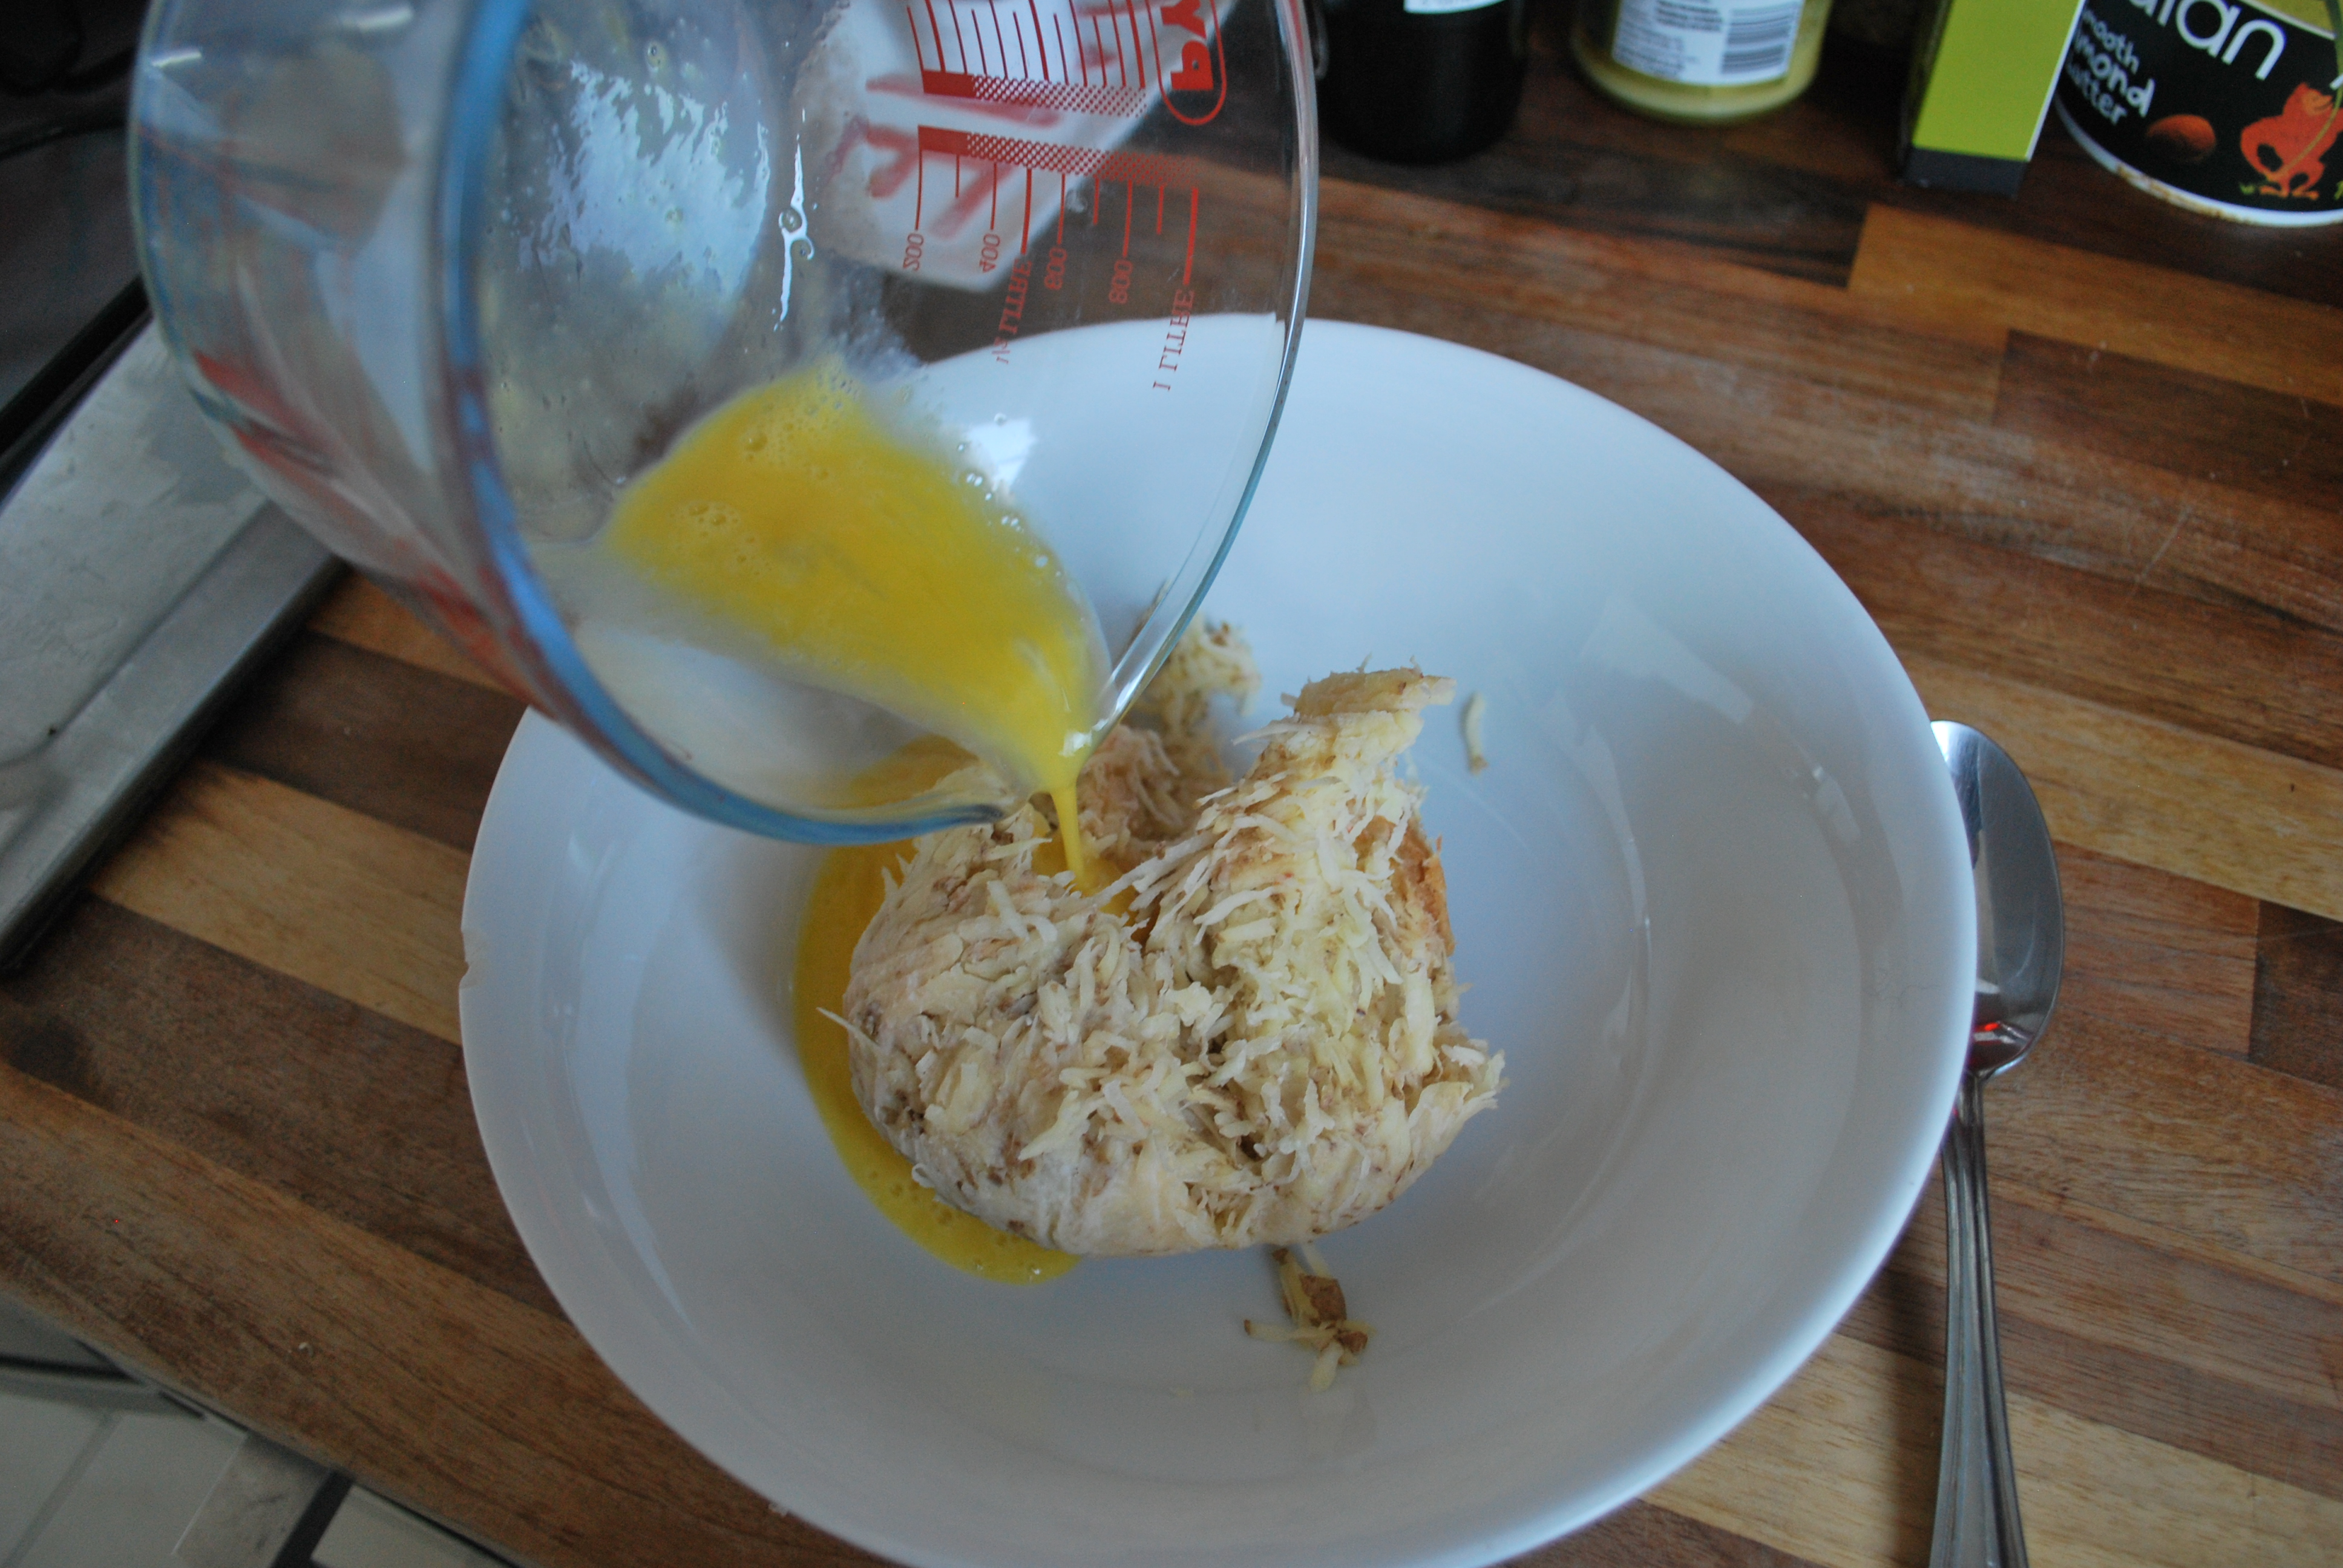 adding-the-egg-to-the-latke-mixture